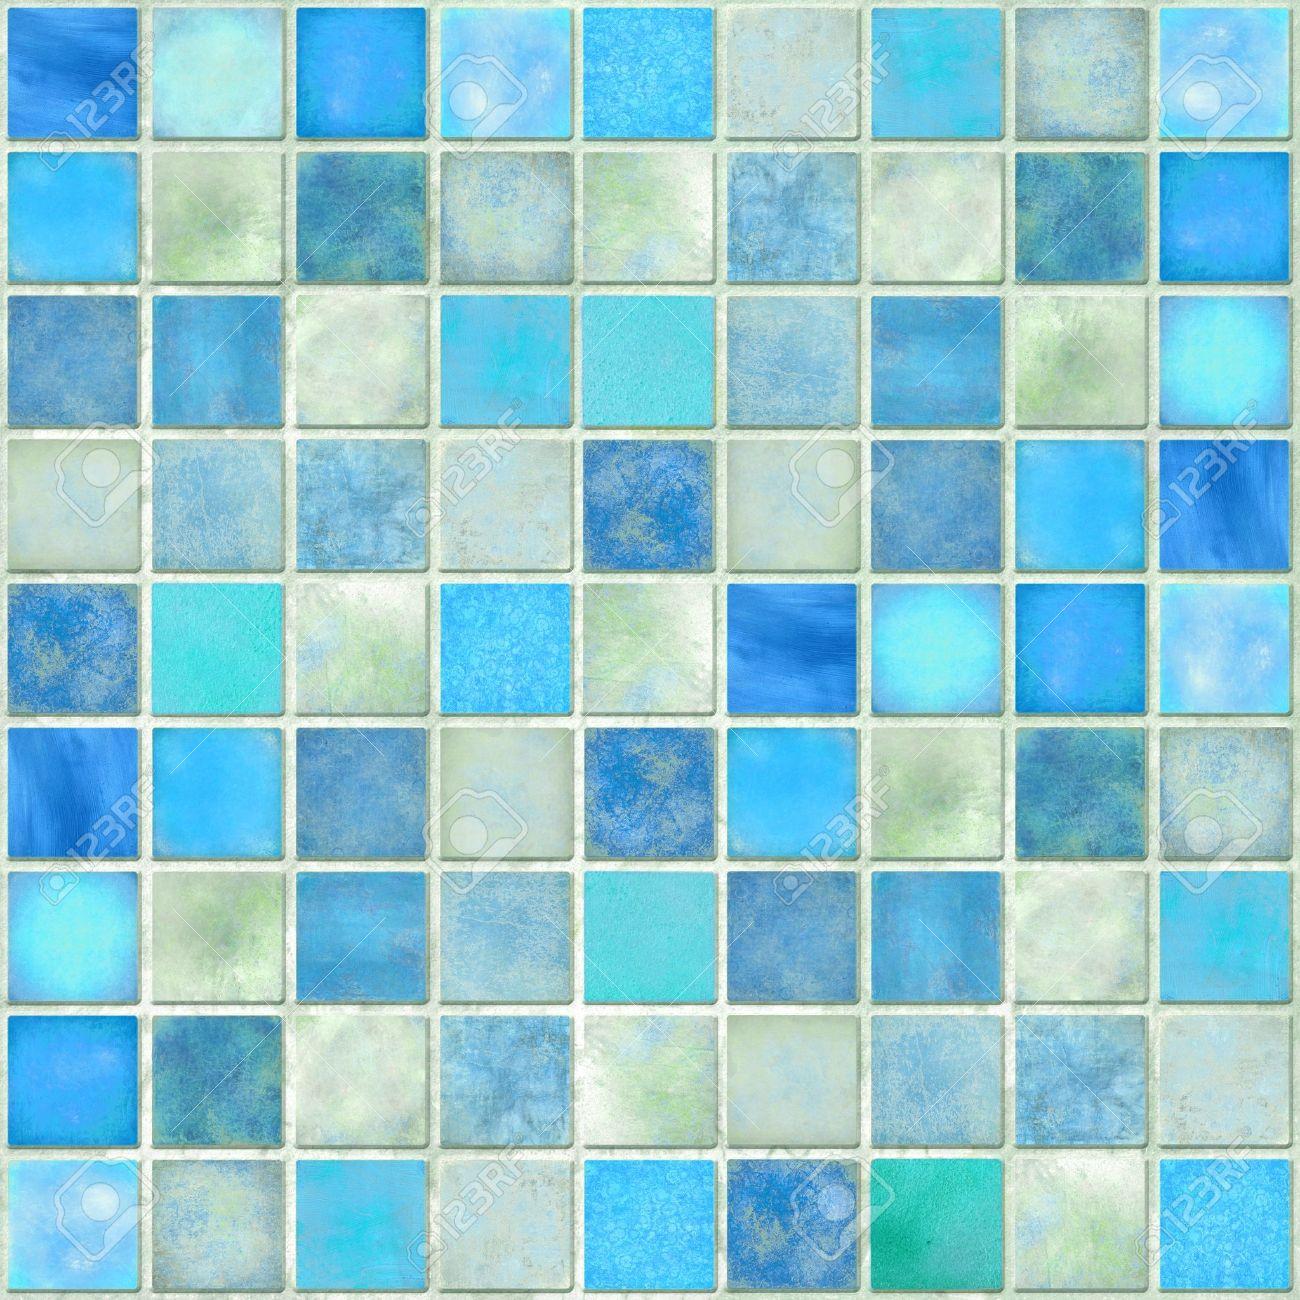 white ceramic tile bathroom wall background stock photo 26509252 ...